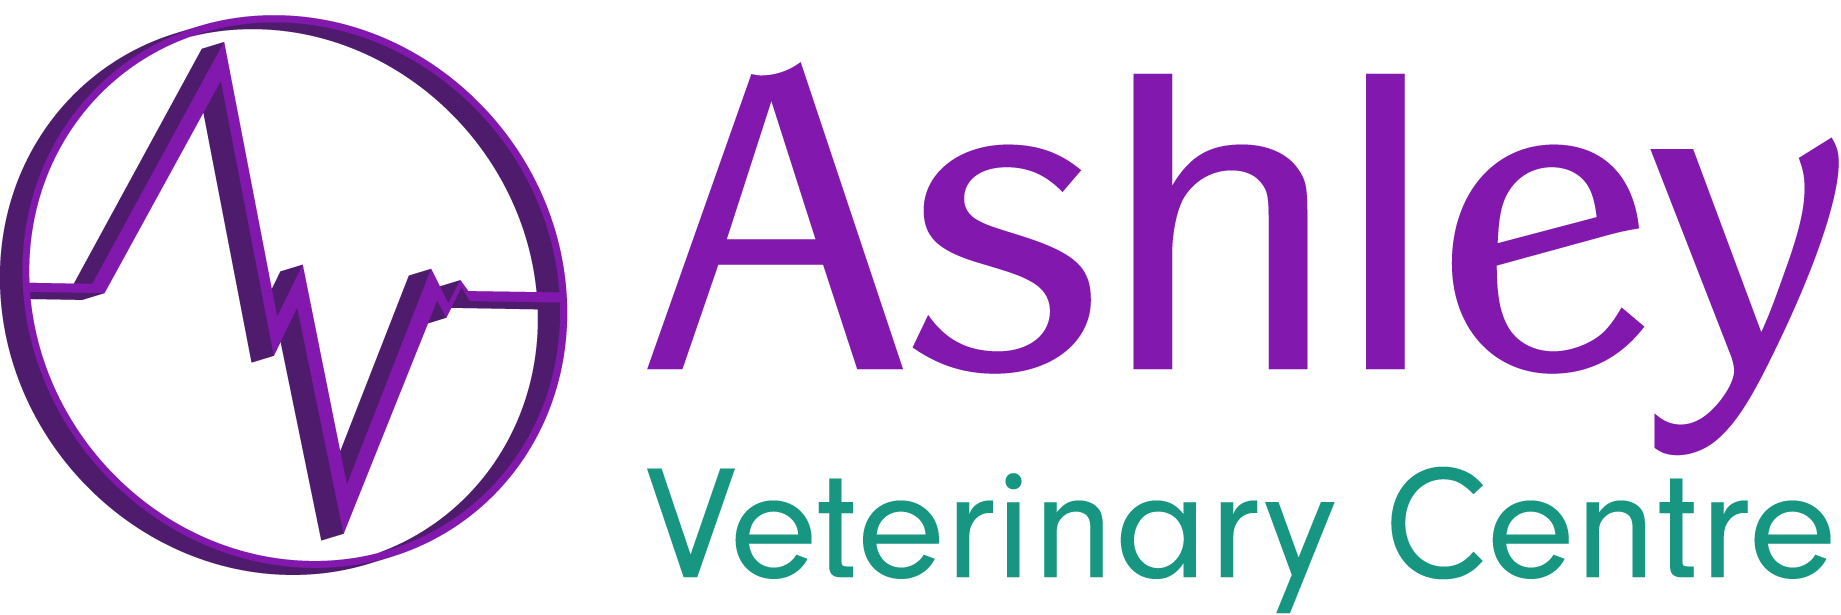 Full or part-time Senior Veterinary Surgeon – Glasgow